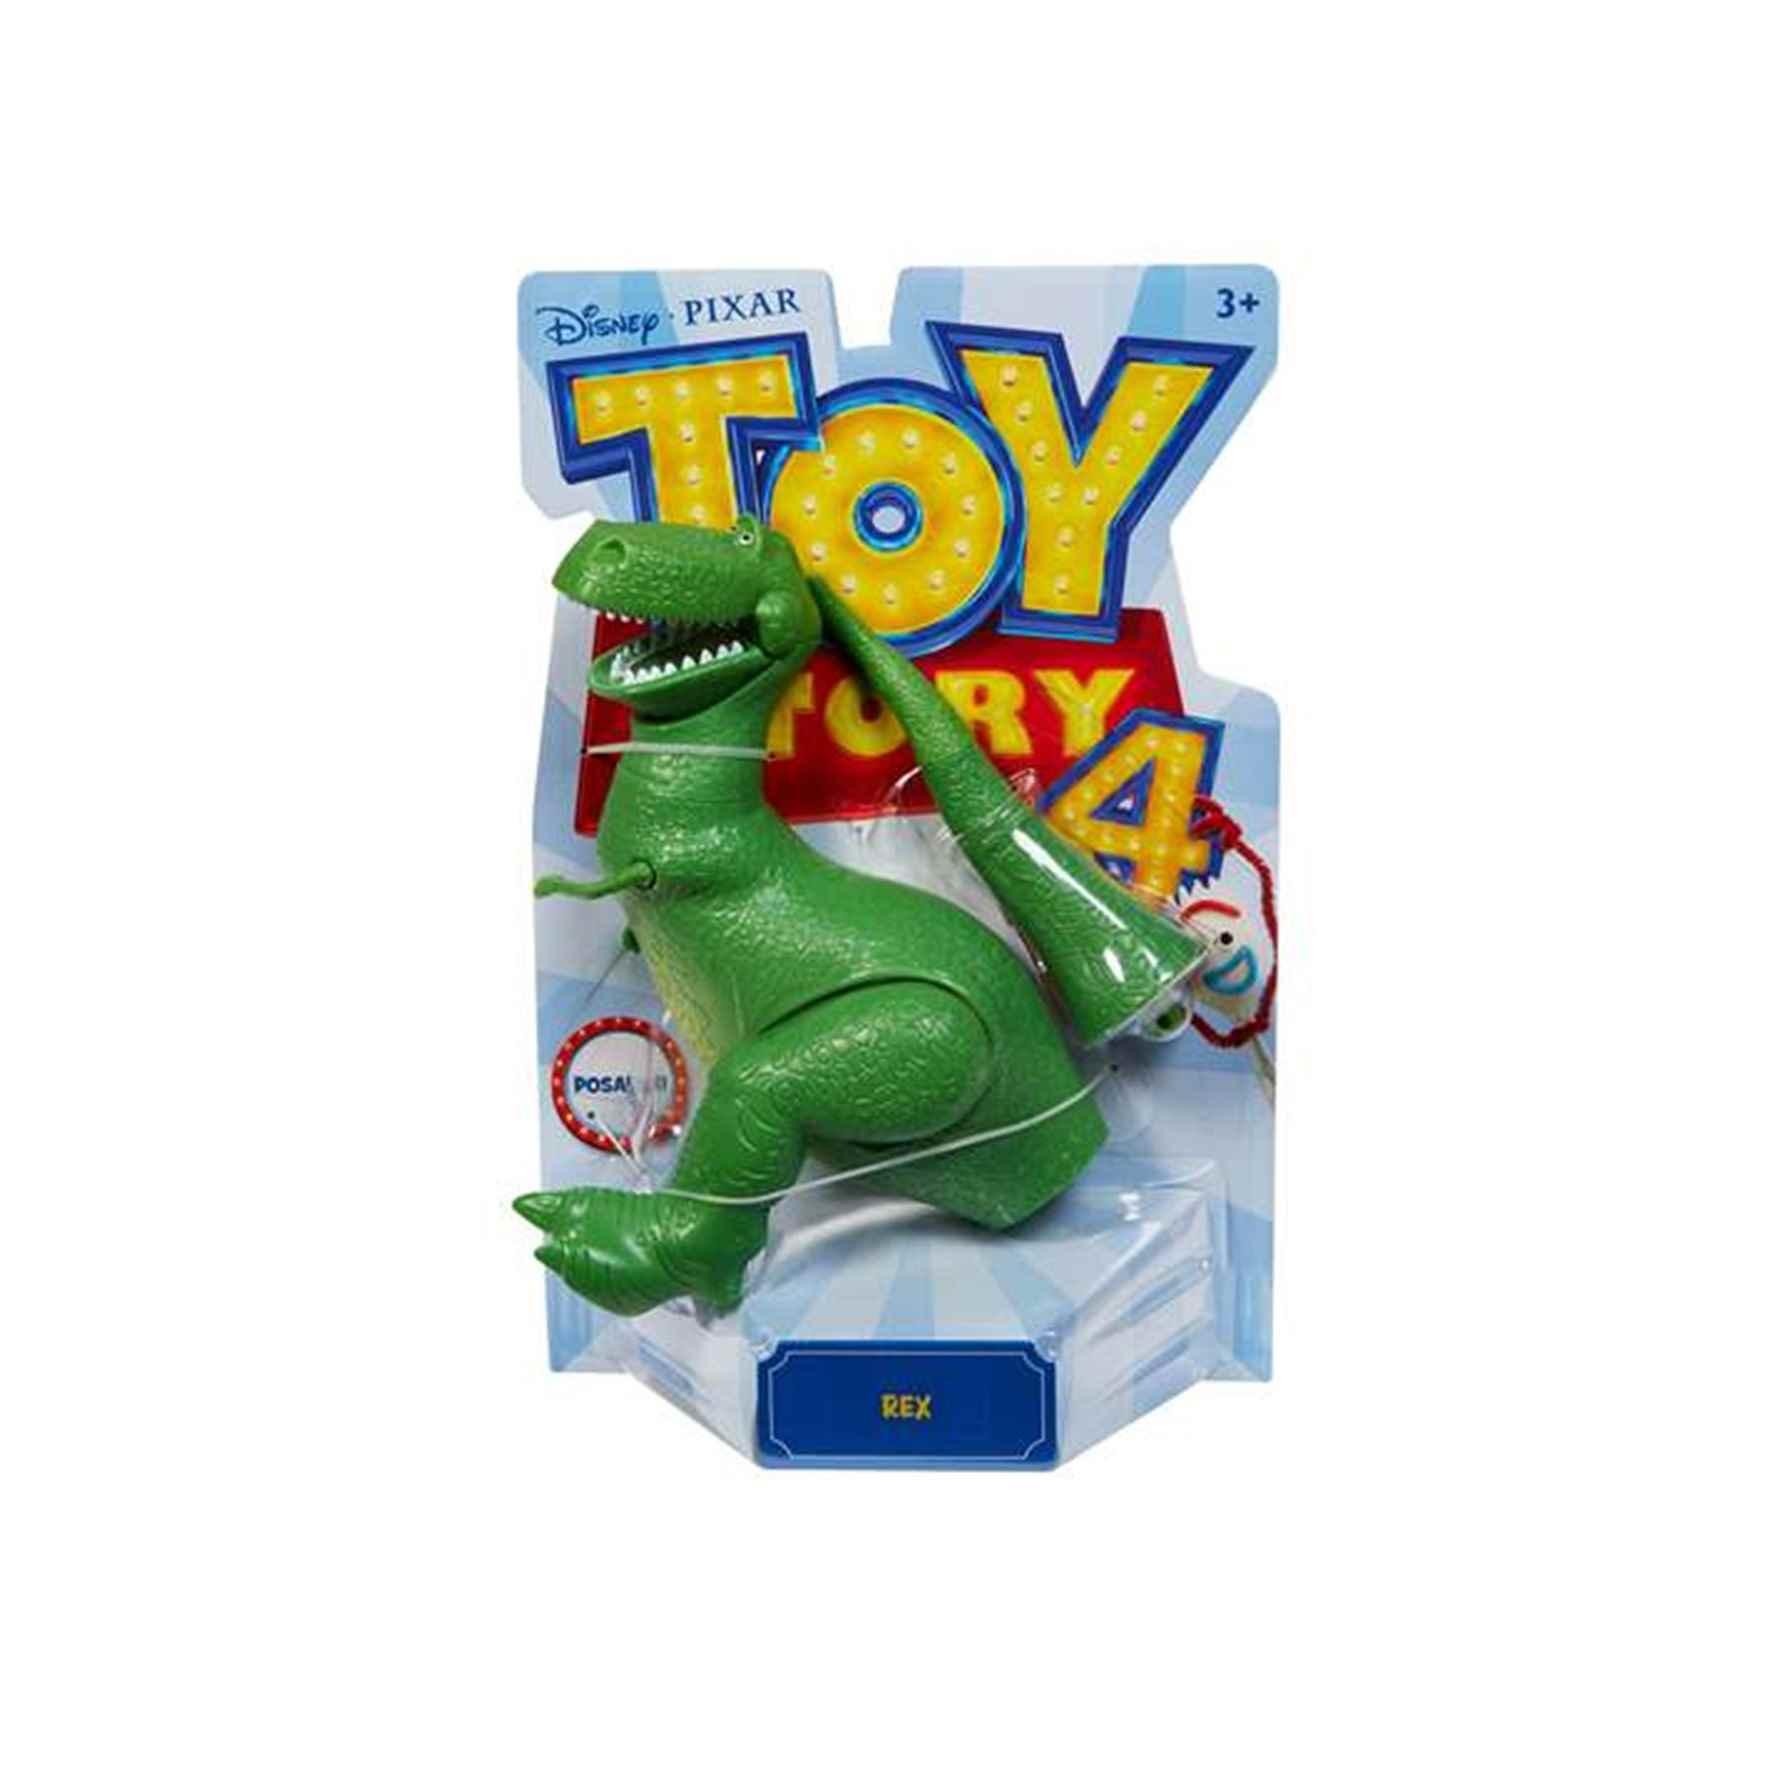 DISNEY TOY STORY 4 Figura Rex - Juguete, DESCUENTO o 2x1